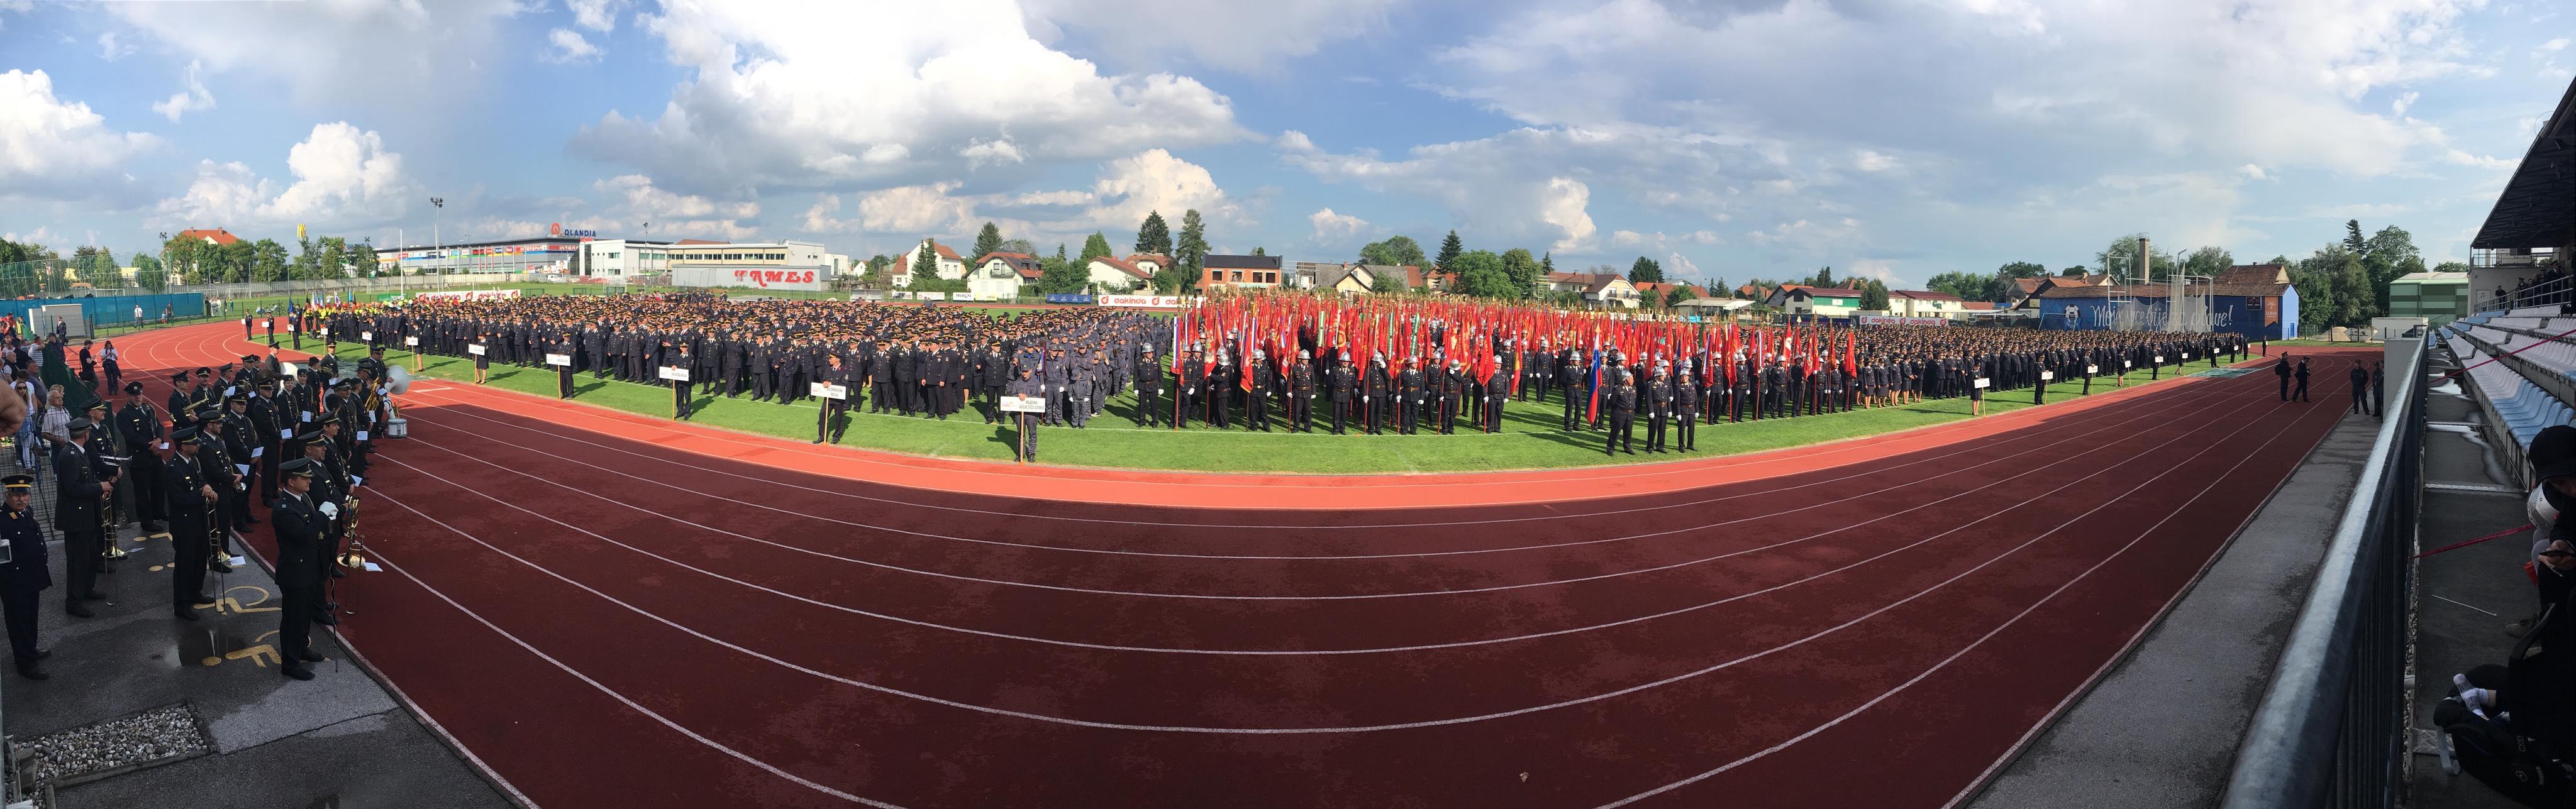 Velika gasilska parada v počastitev 17. kongresa Gasilske zveze Slovenije 2